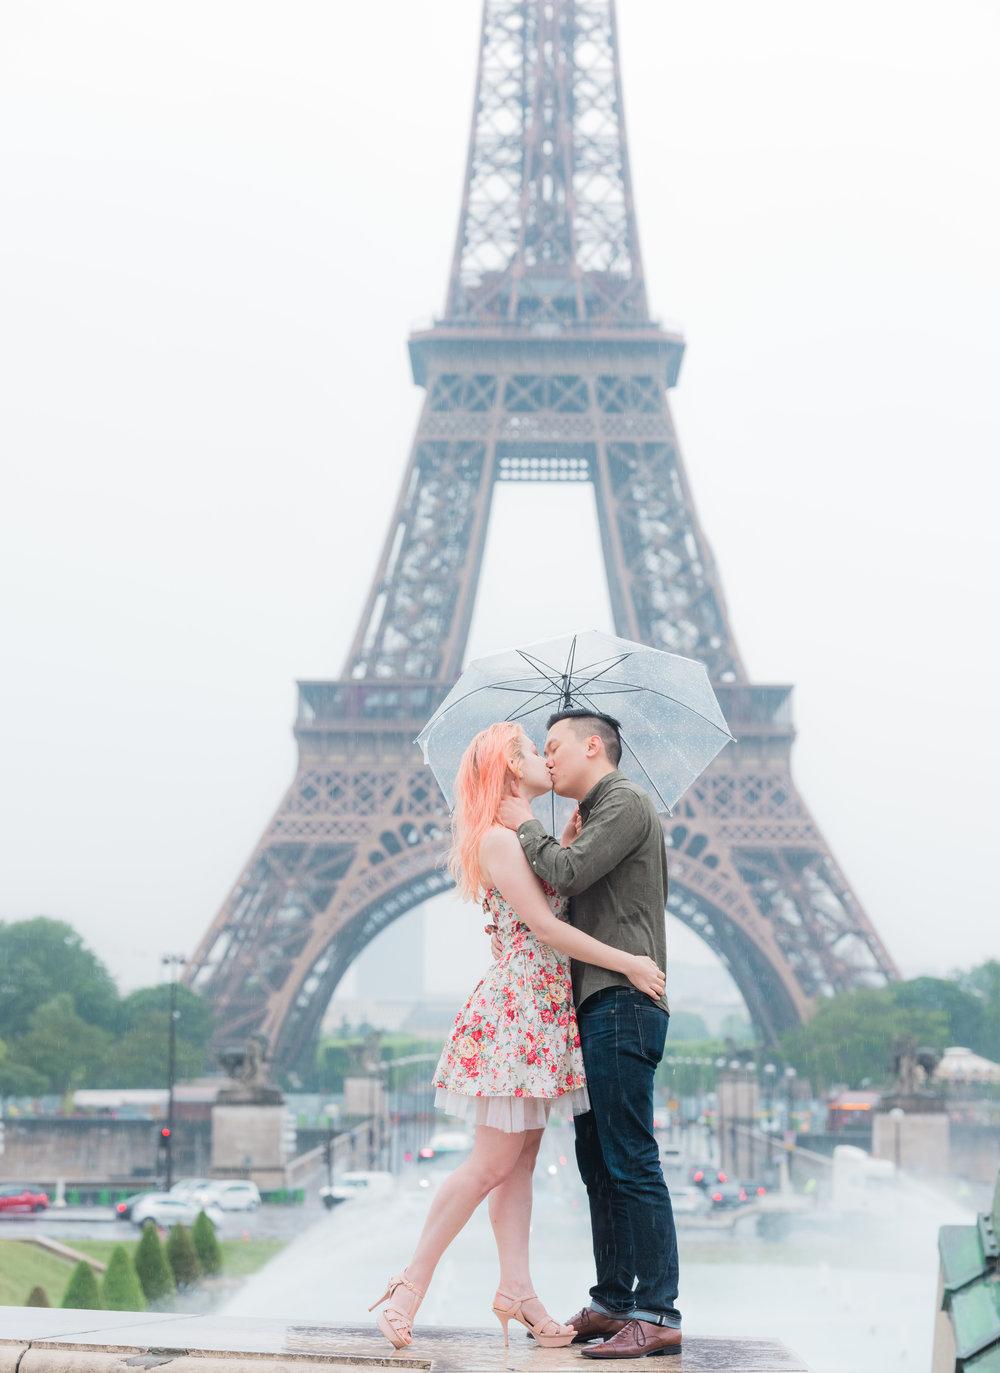 beautiful rainy day photo shoot in paris france at trocadero eiffel tower